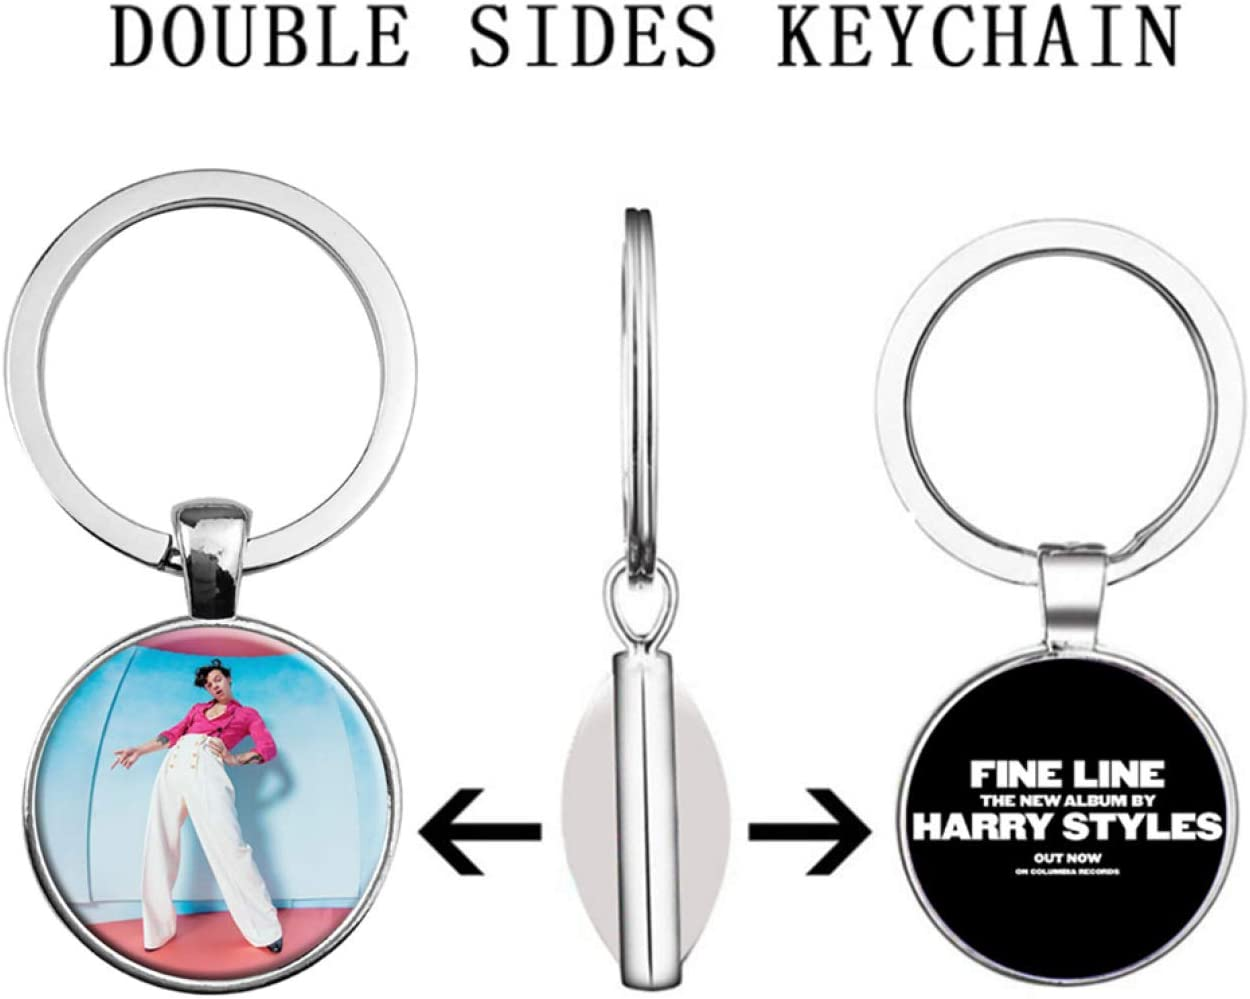 None 1 Shanxia Original New 2020 H/árry Styl/és Key chain Stainless Steel Keychain H/árry Styl/és Time Gem Gifts